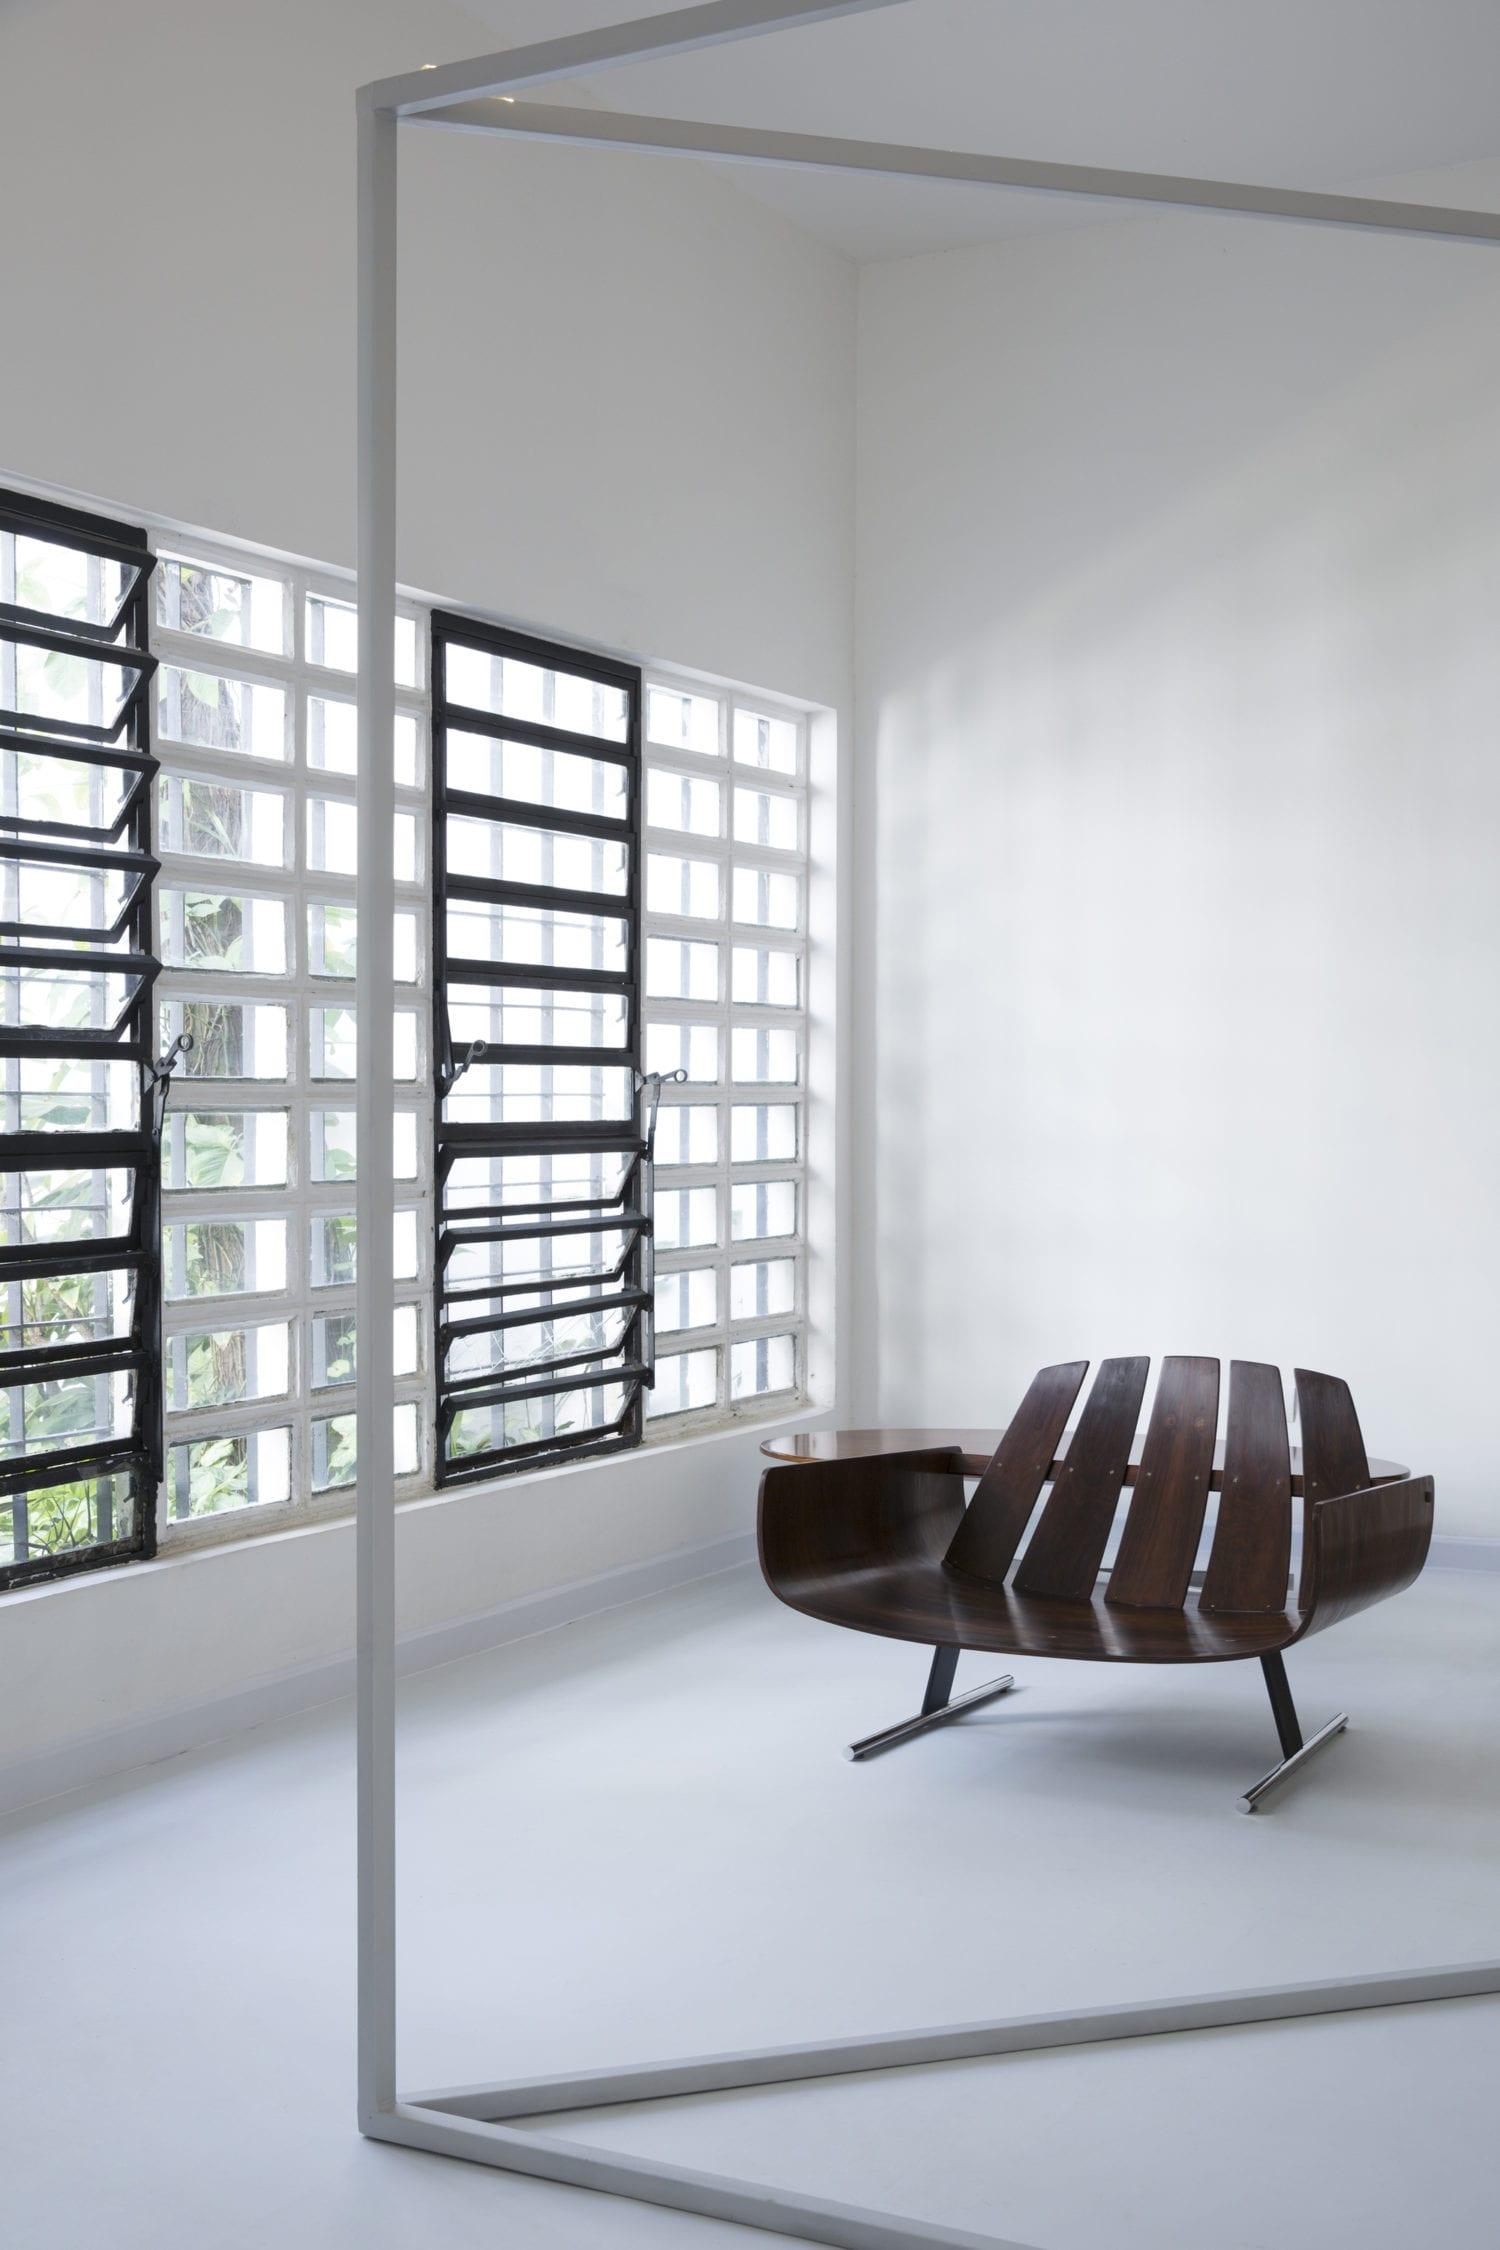 Apartment 61 Home Gallery In Sao Paulo Brazil By Mnma Studio Yellowtrace 07